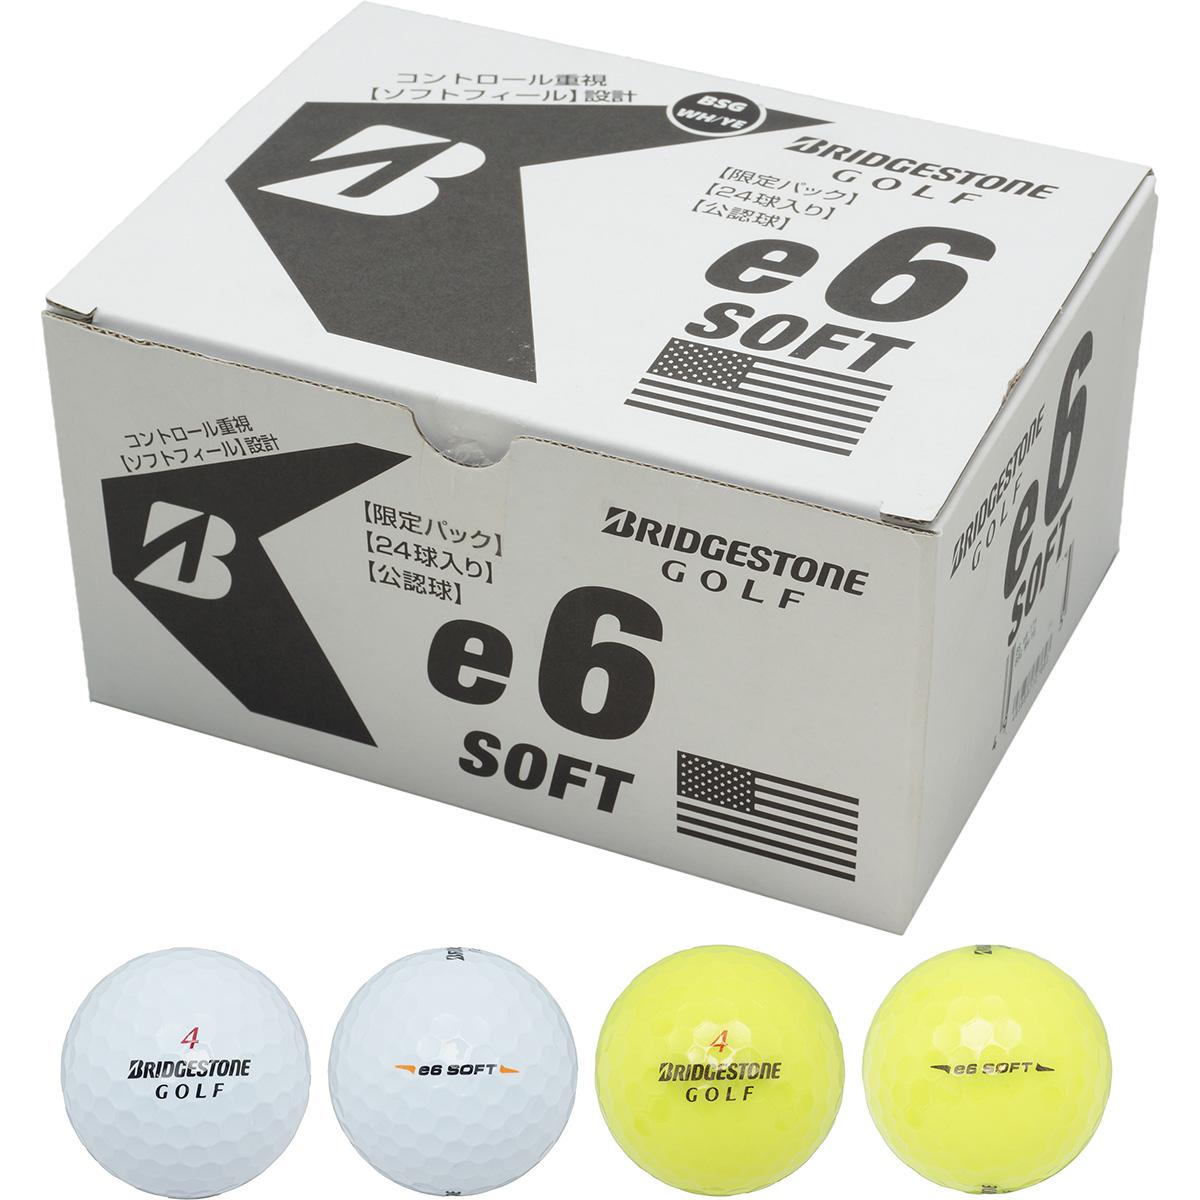 e6 SOFT ボール 2ダースセット